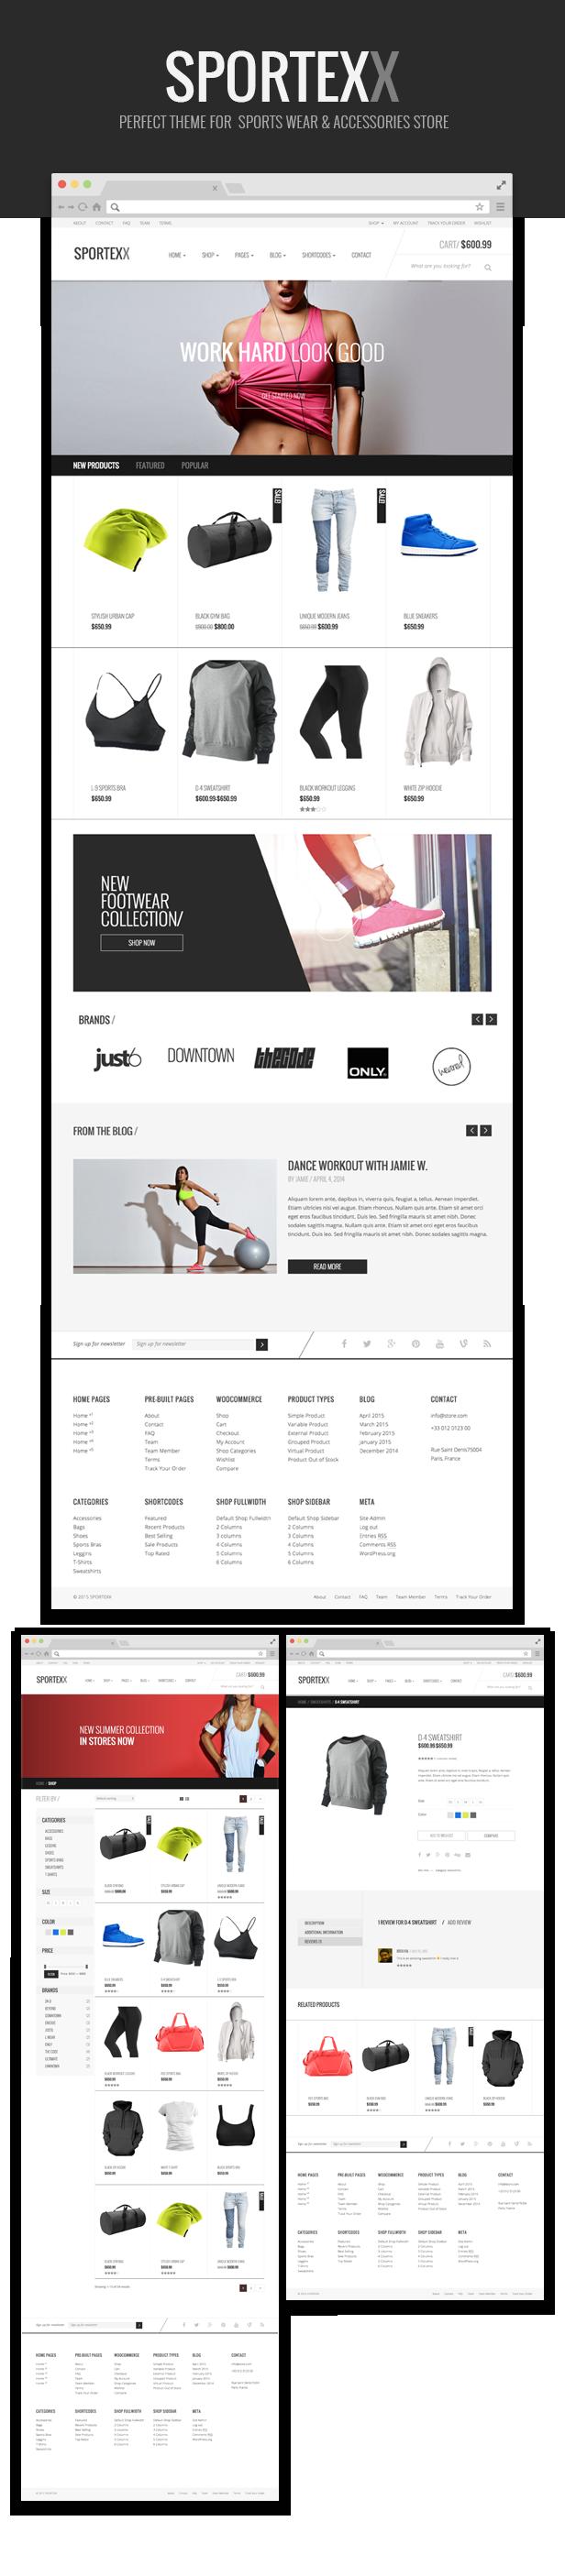 Sportexx - Sports & Gym Fashion WooCommerce Theme - 6